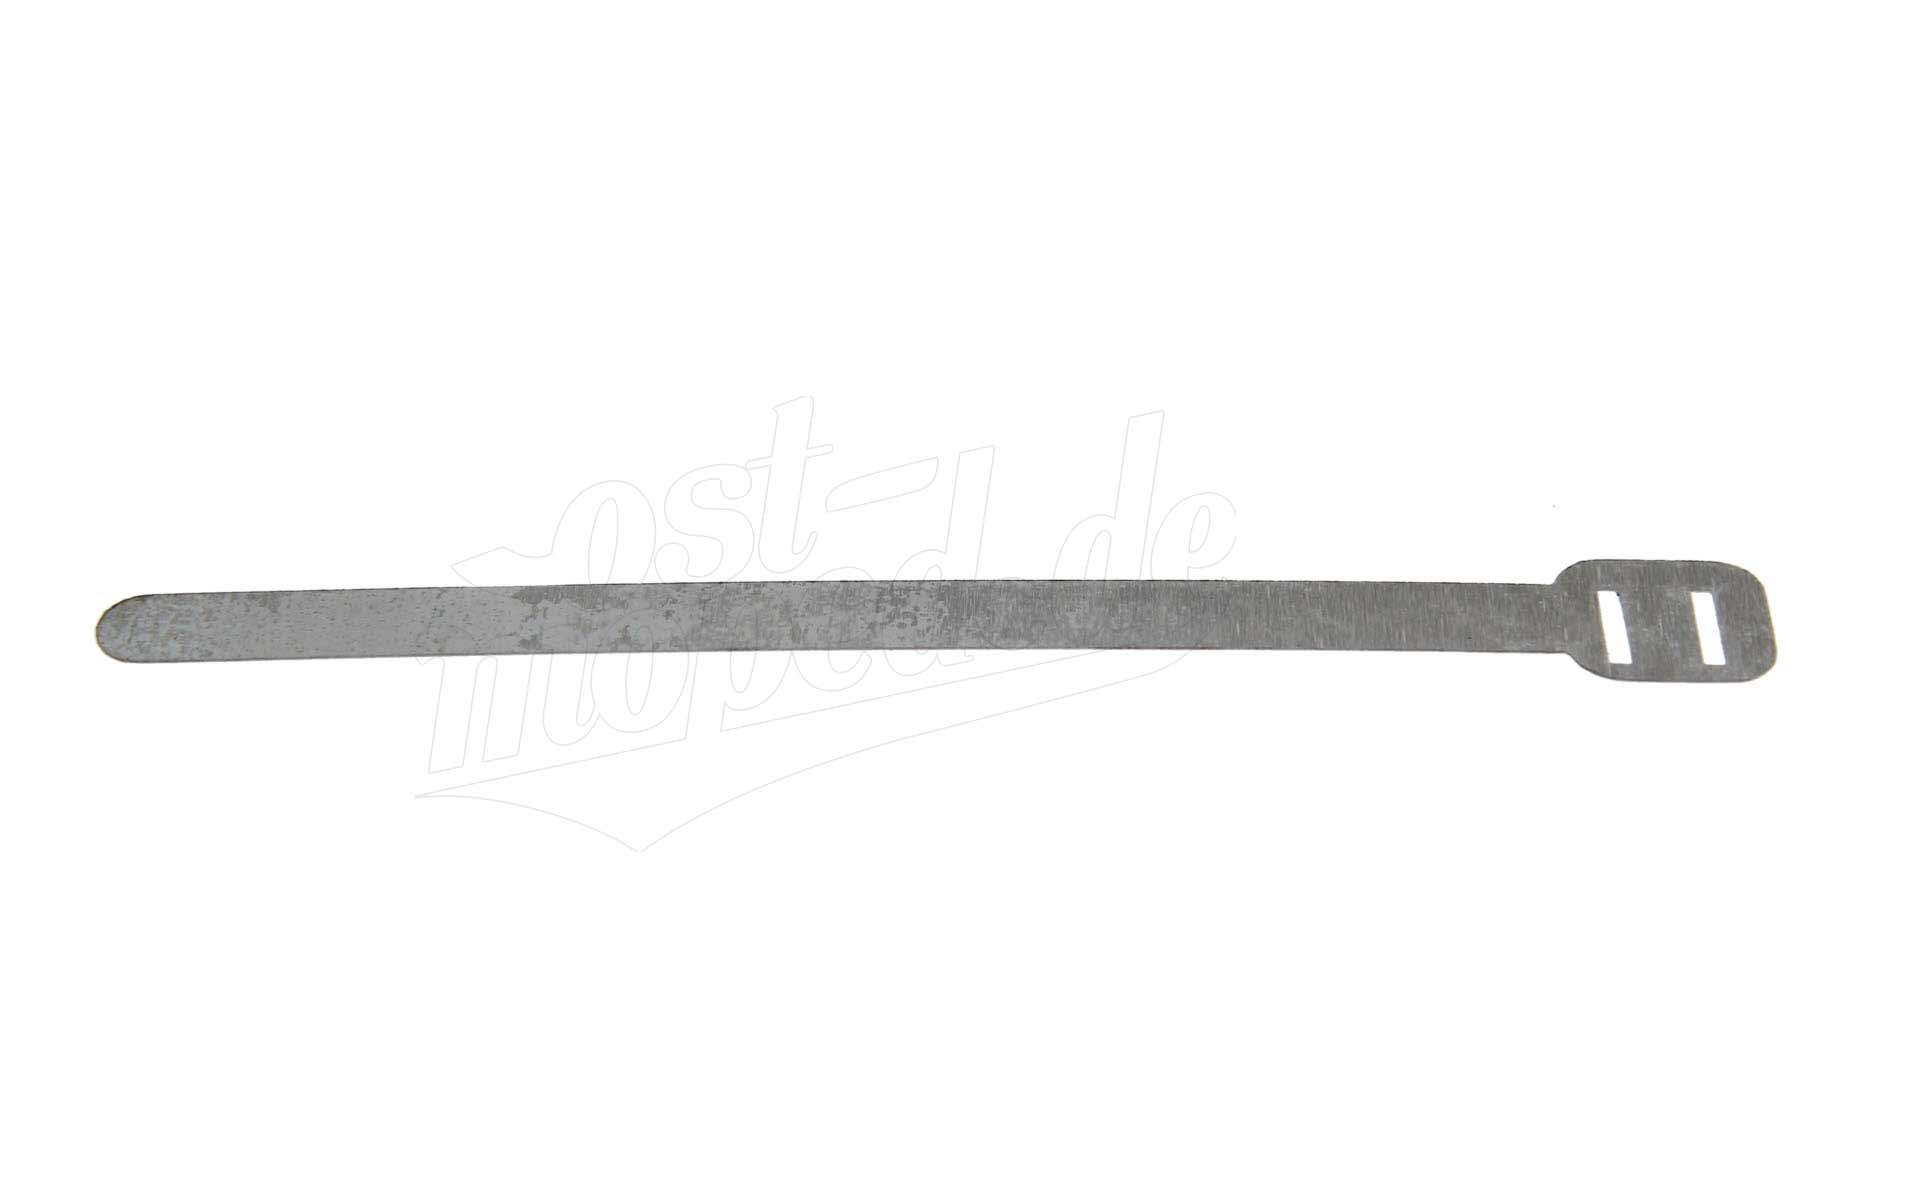 DDR Kabelbinder Aluminium 6mm breit 180mm lang jetzt ..